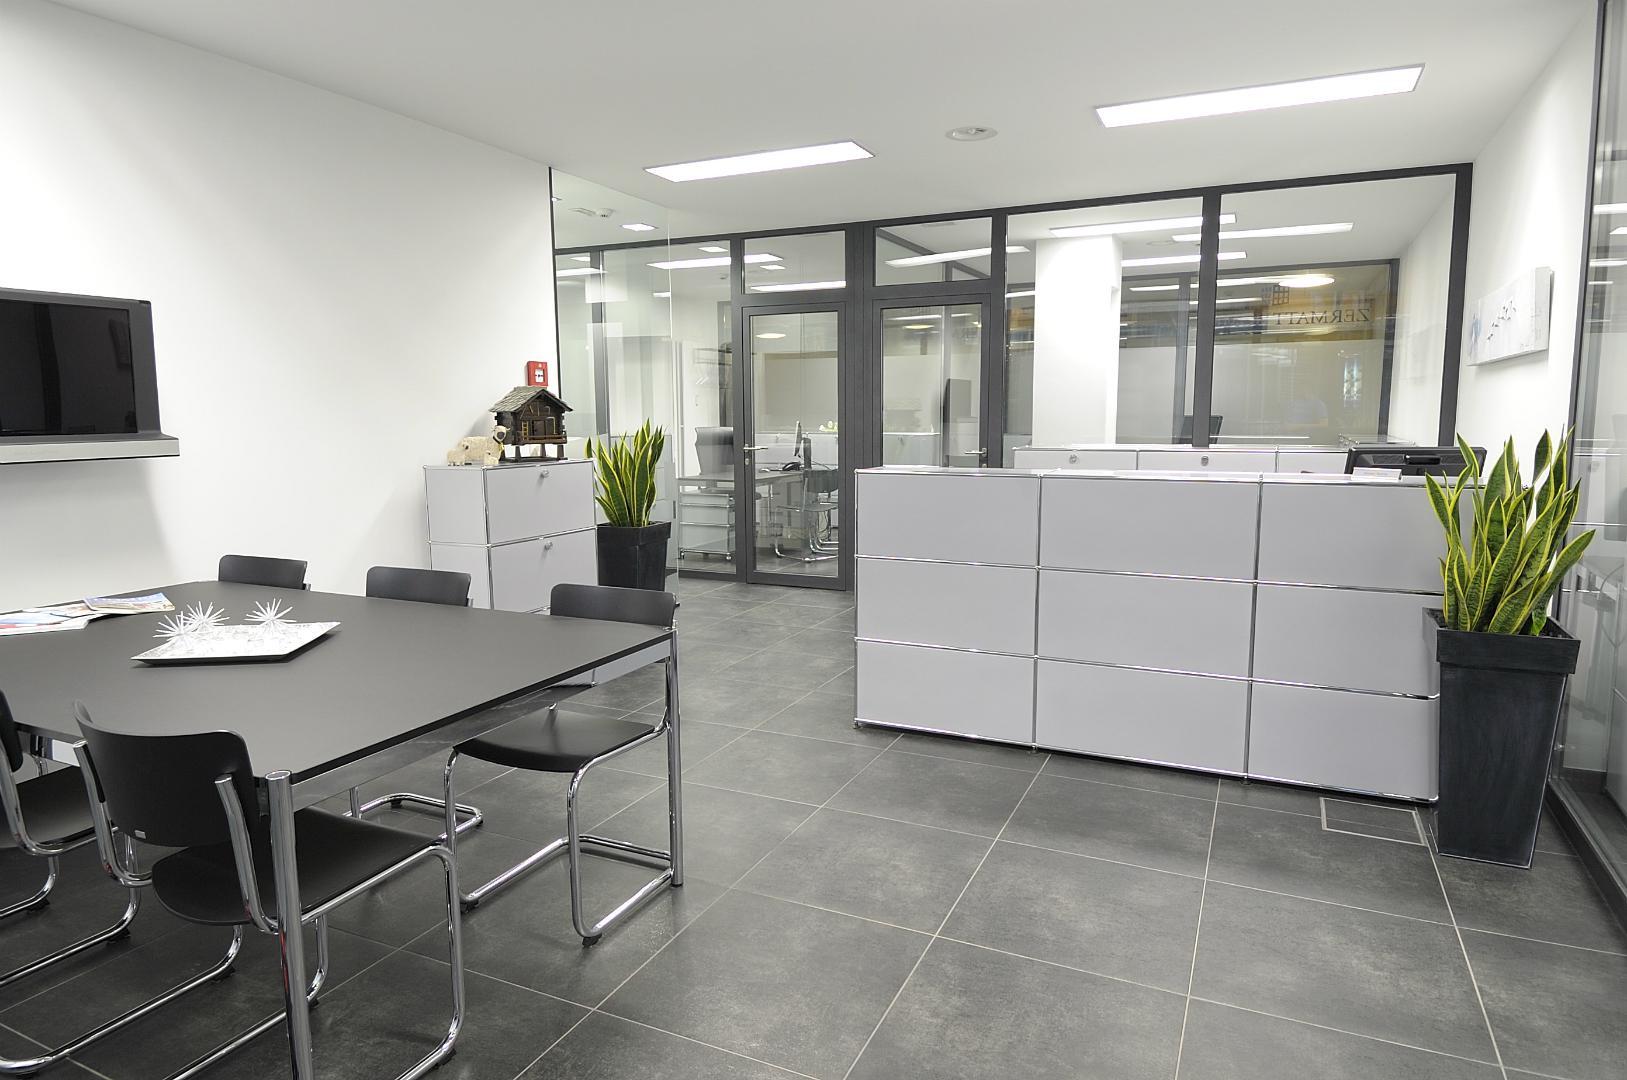 zermatthomes immobilien lochmatter ag bureau. Black Bedroom Furniture Sets. Home Design Ideas